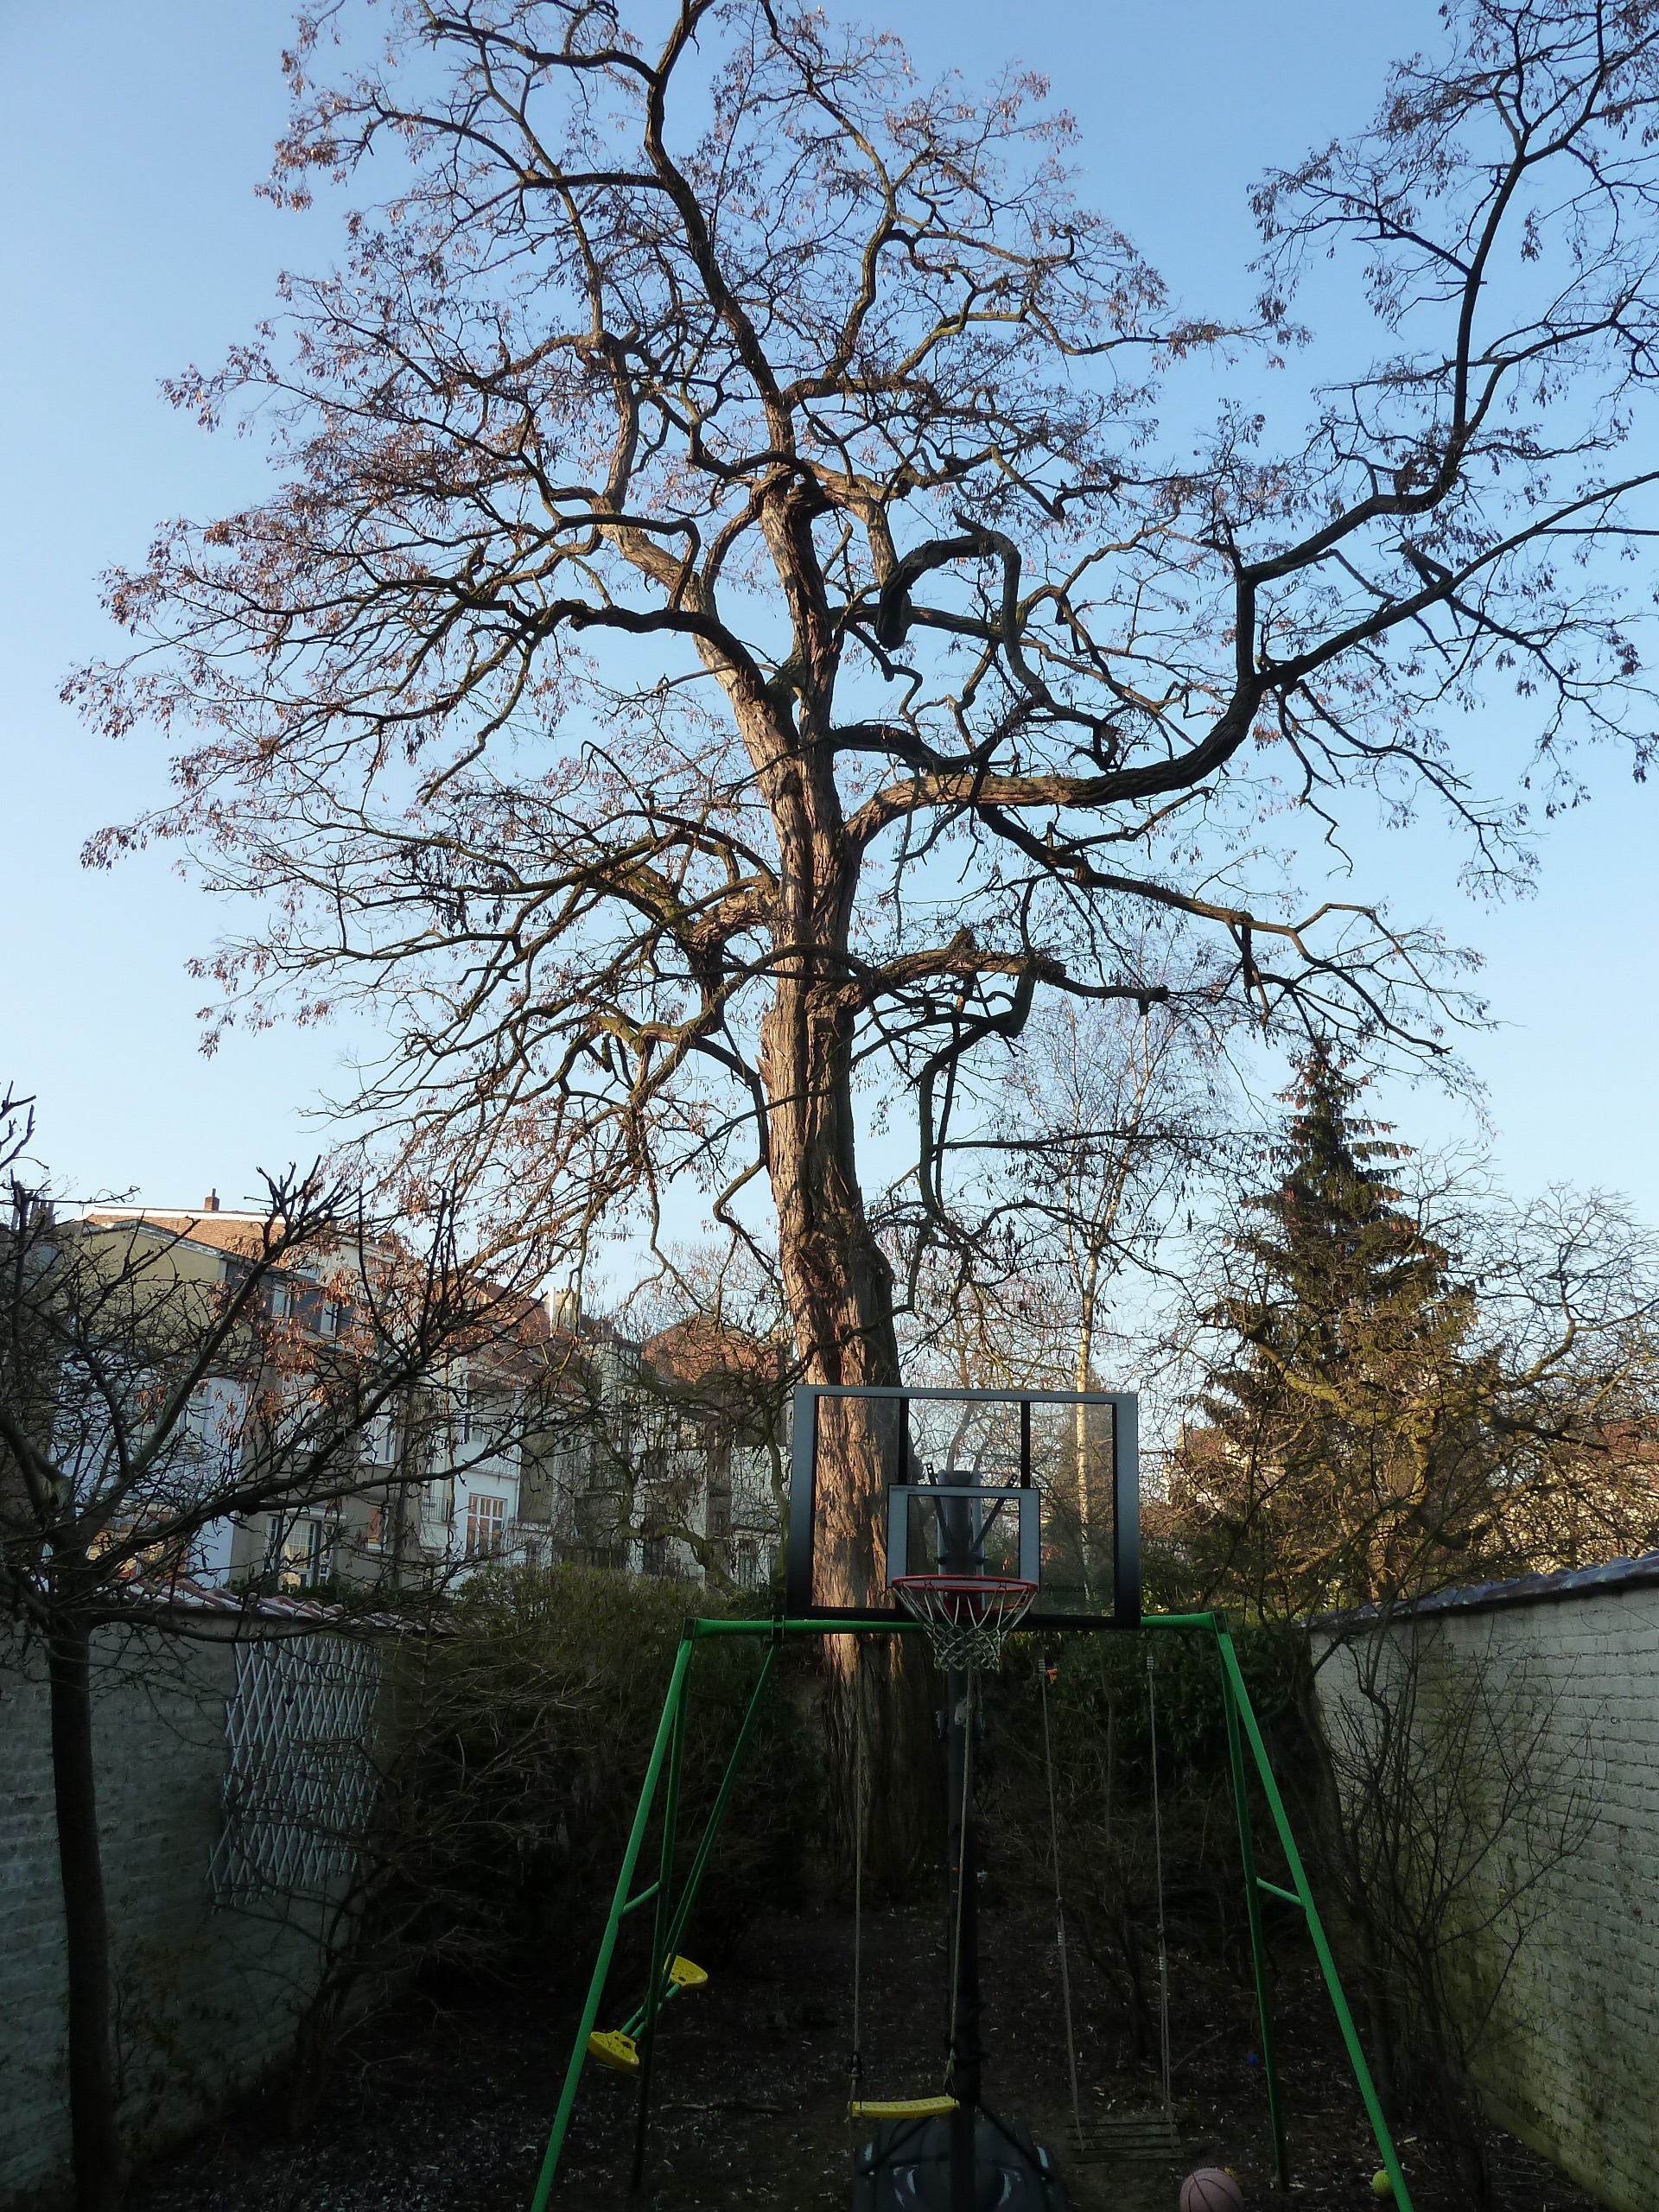 Robinier faux-acacia – Ixelles, Rue Edmond Picard, 13 –  01 Février 2011